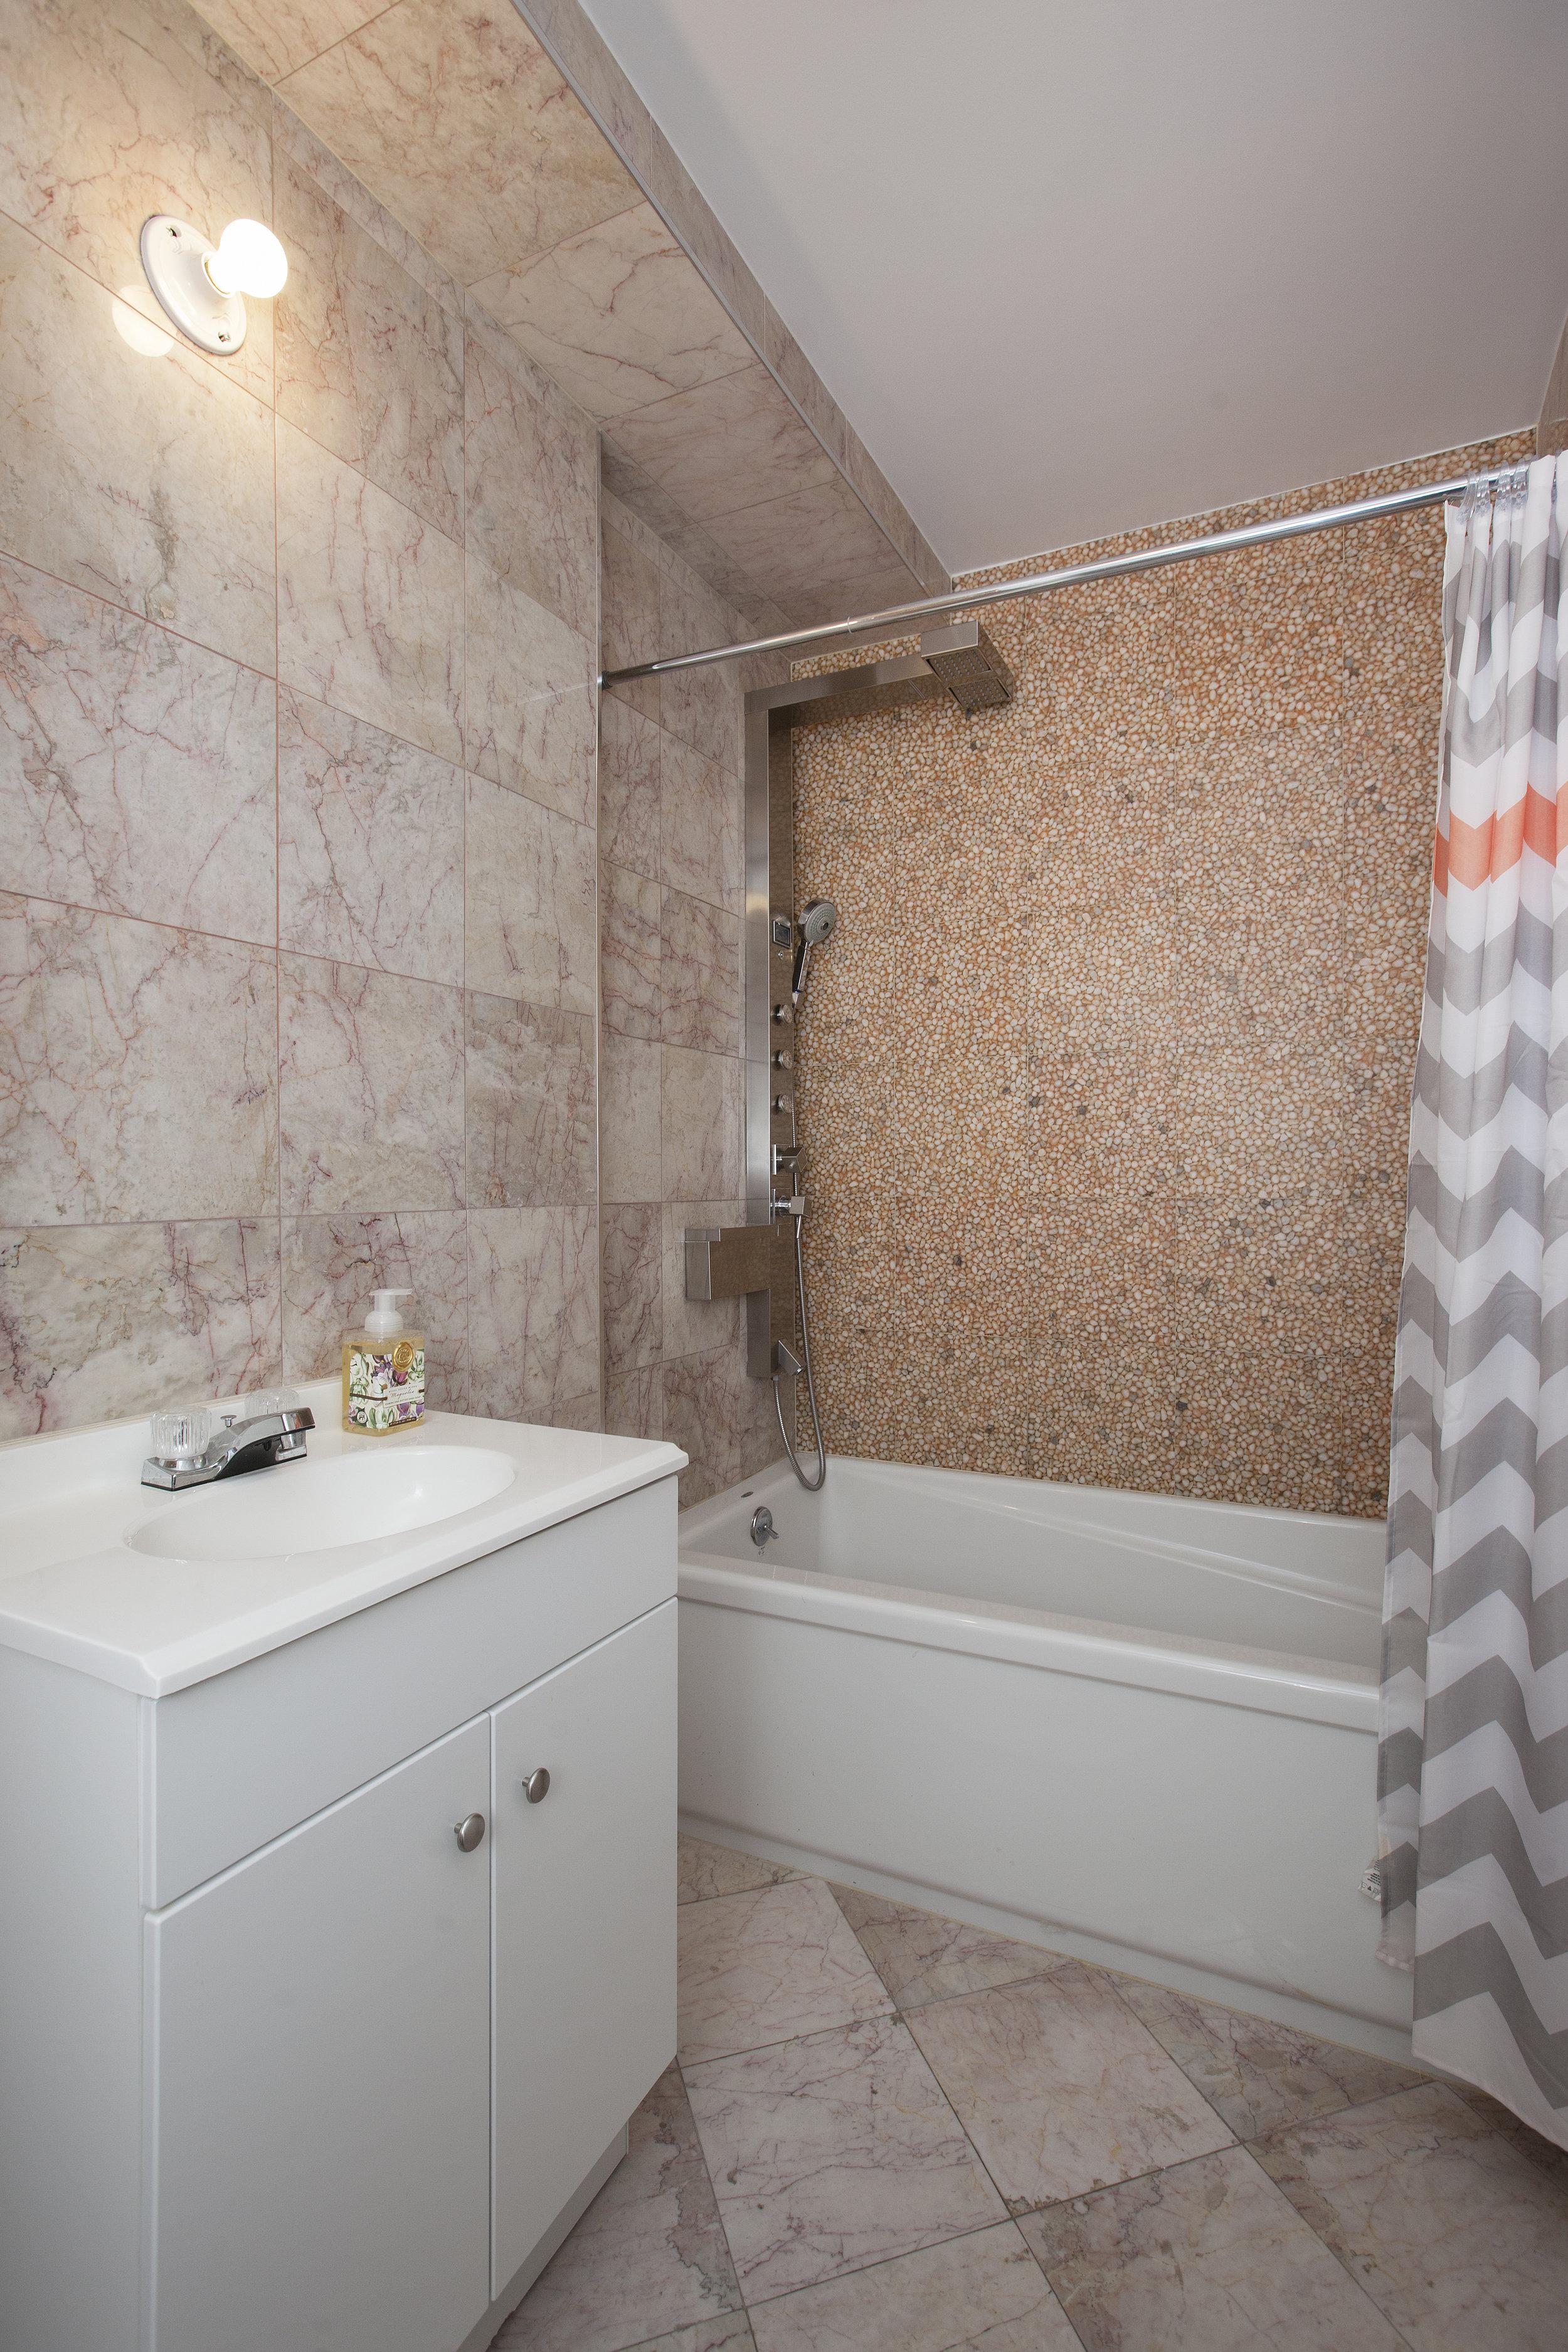 East_76th_Street_195_TH_Bathroom_.jpg